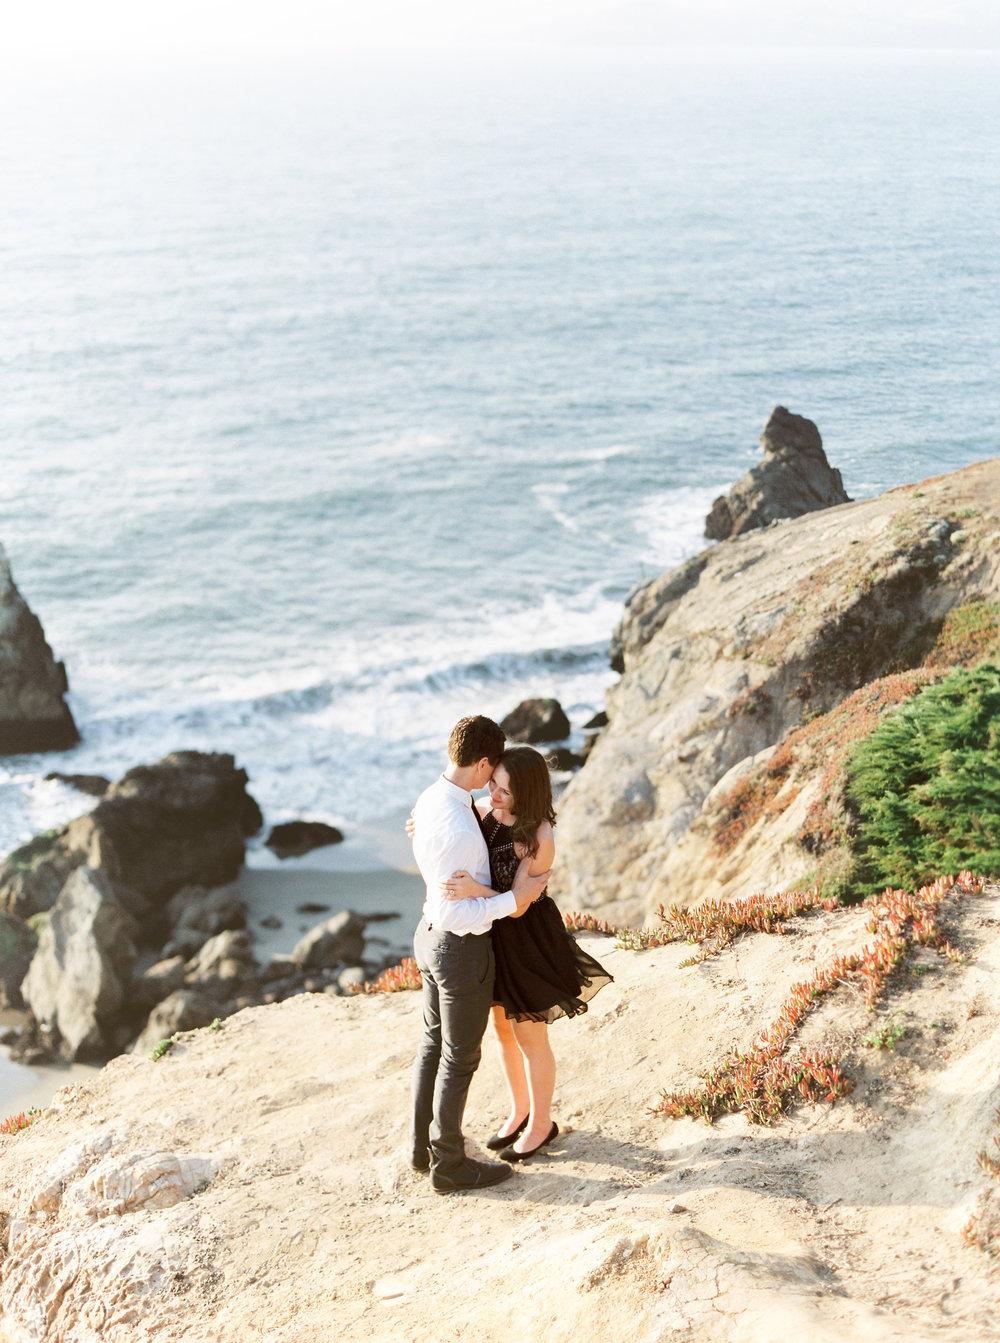 sutro-baths-san-francisco-california-engagement-30.jpg